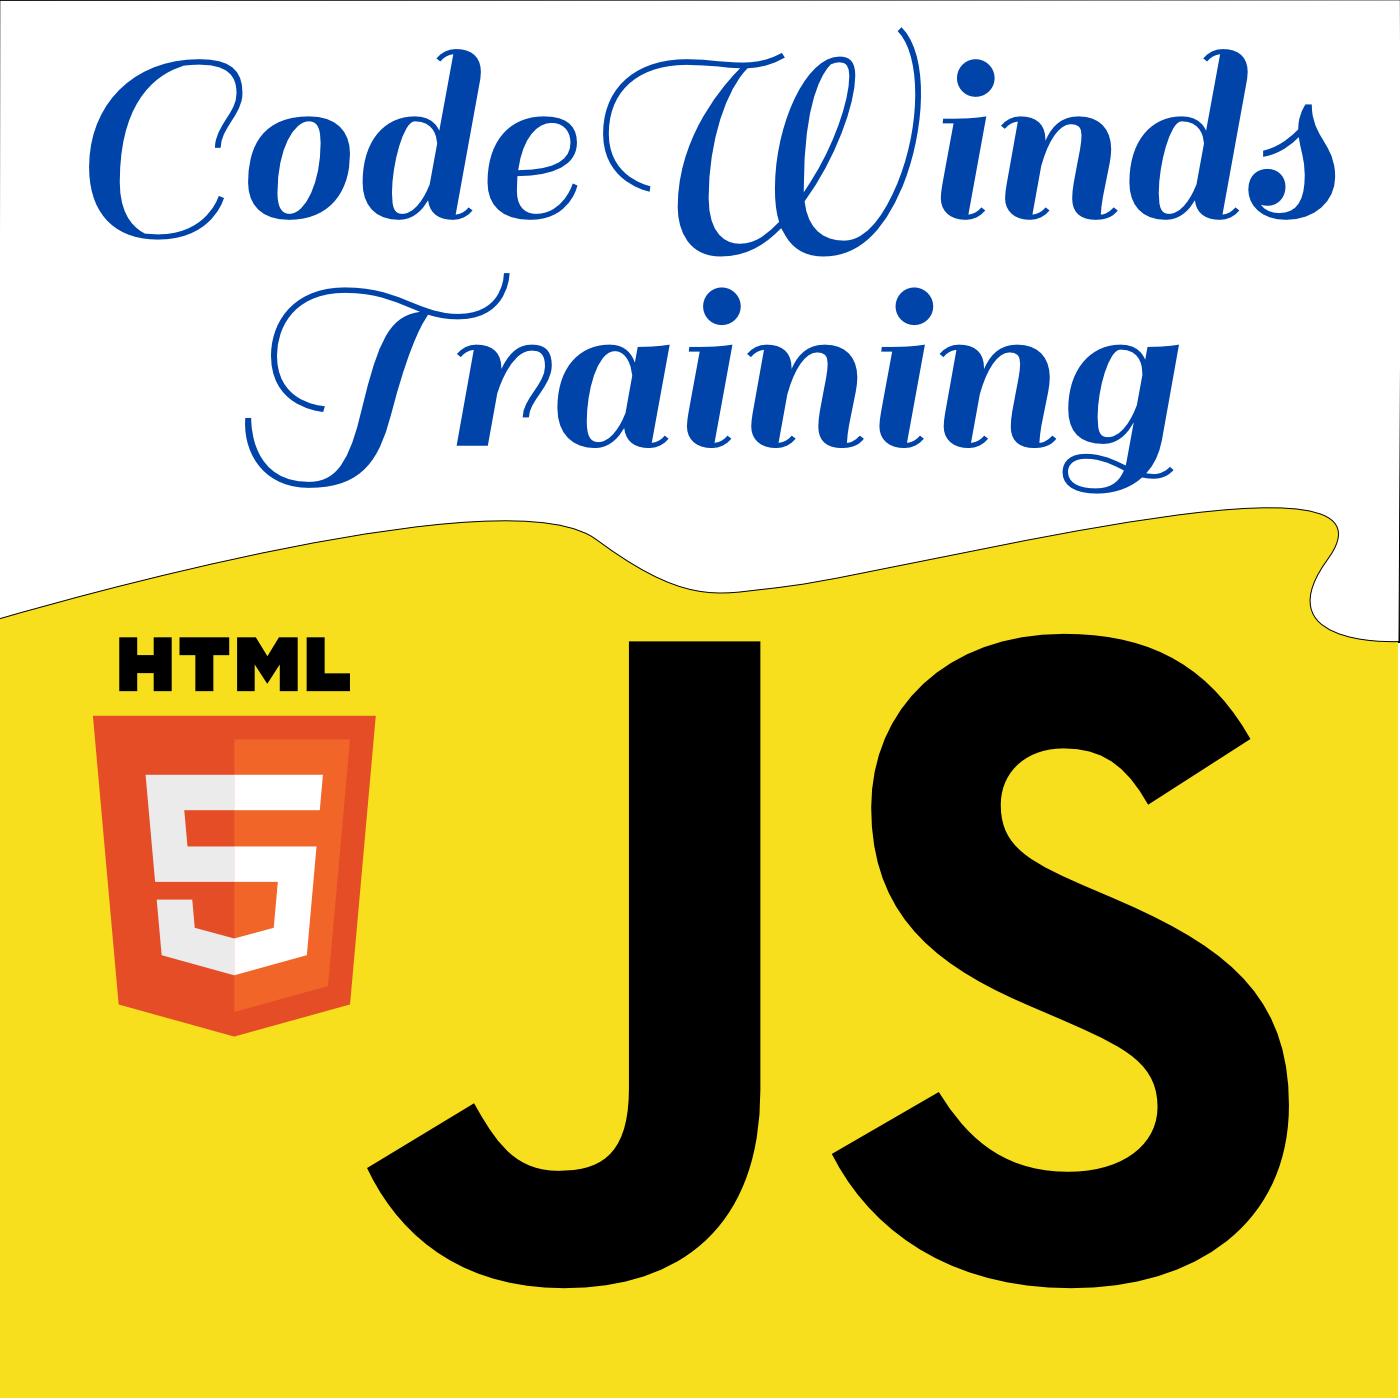 cw-training-logo